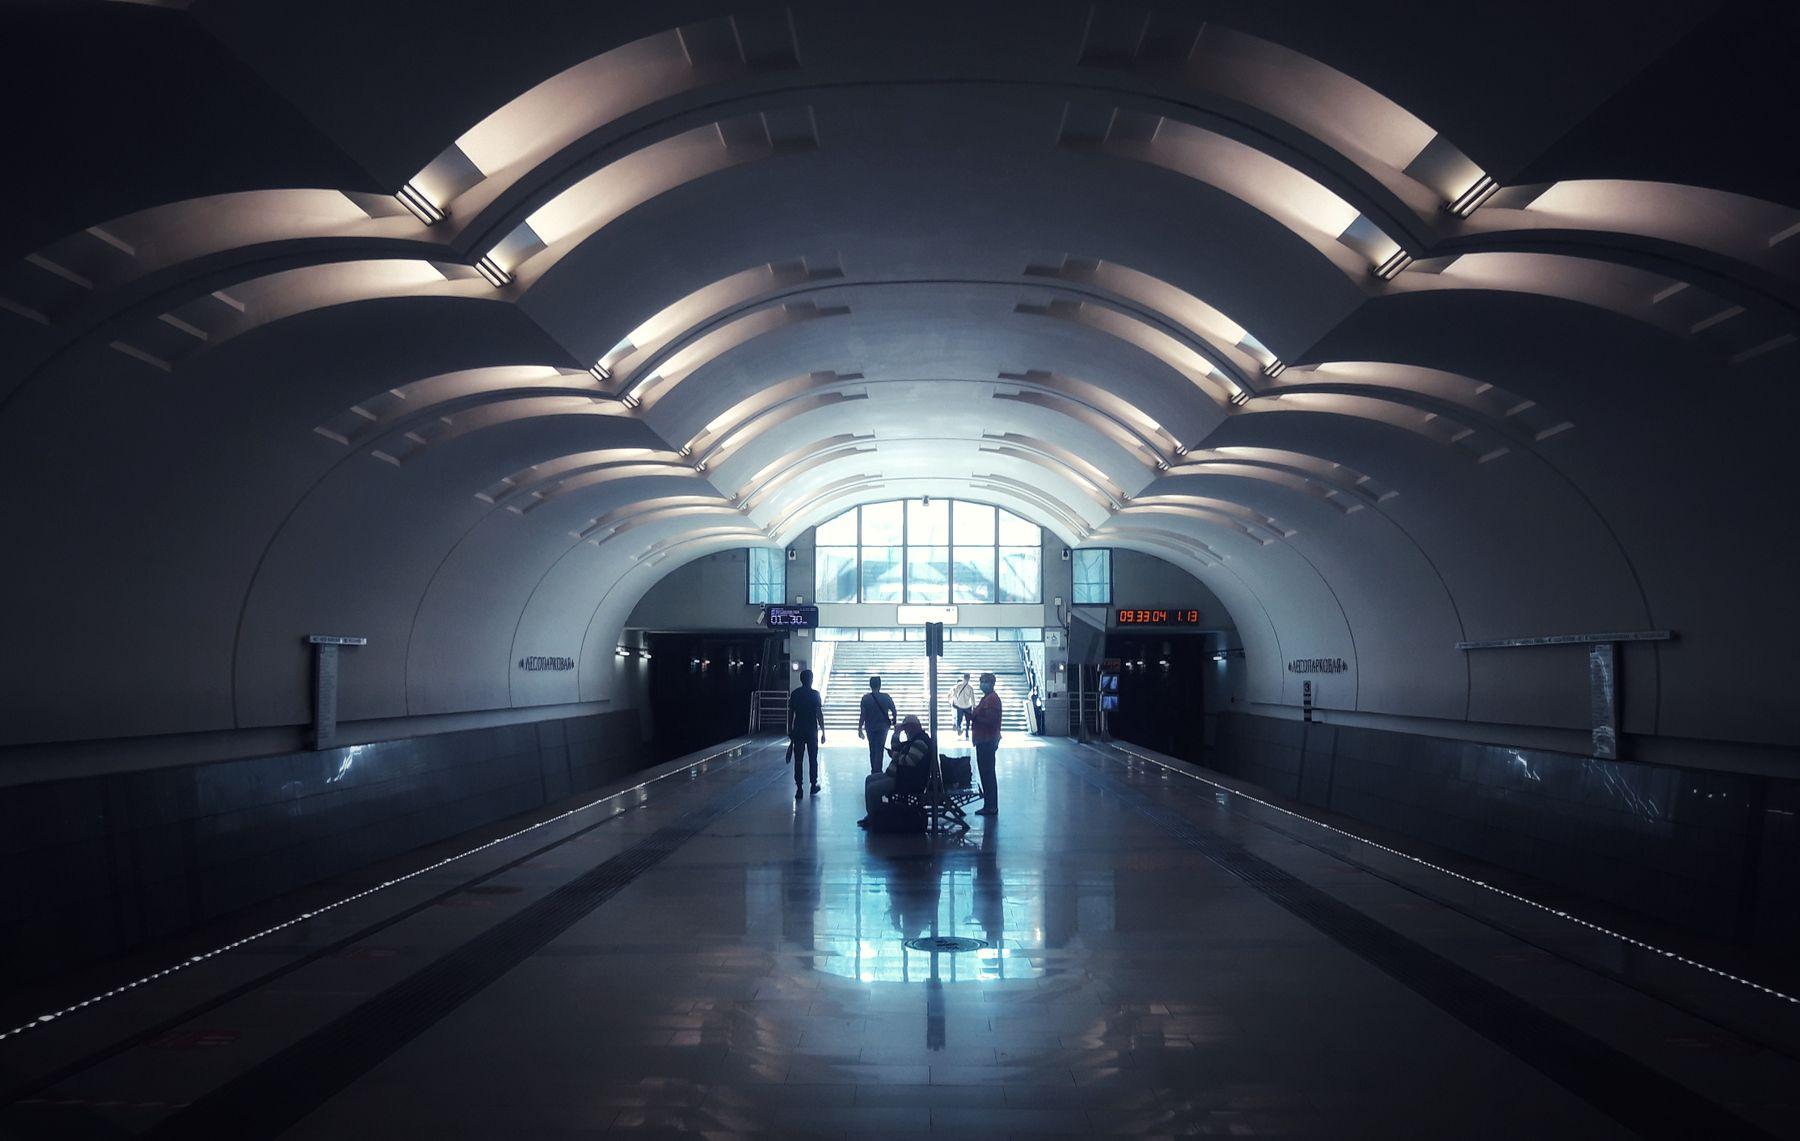 *** московский метрополитен танция метро лесопарковая samsung galaxy a6